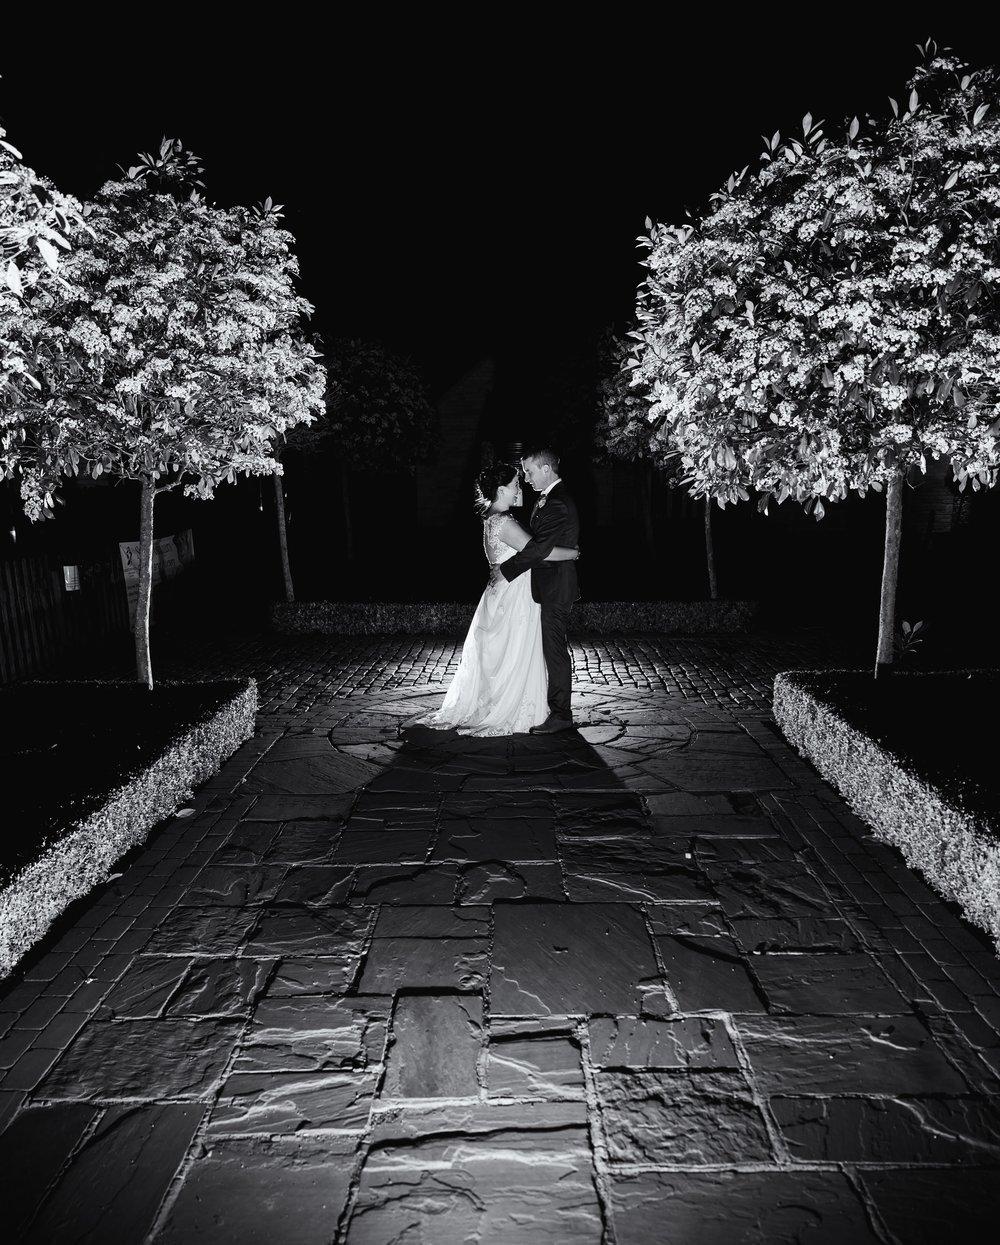 Wedding photographer in Oxfordshire, bicester, banbury, henley